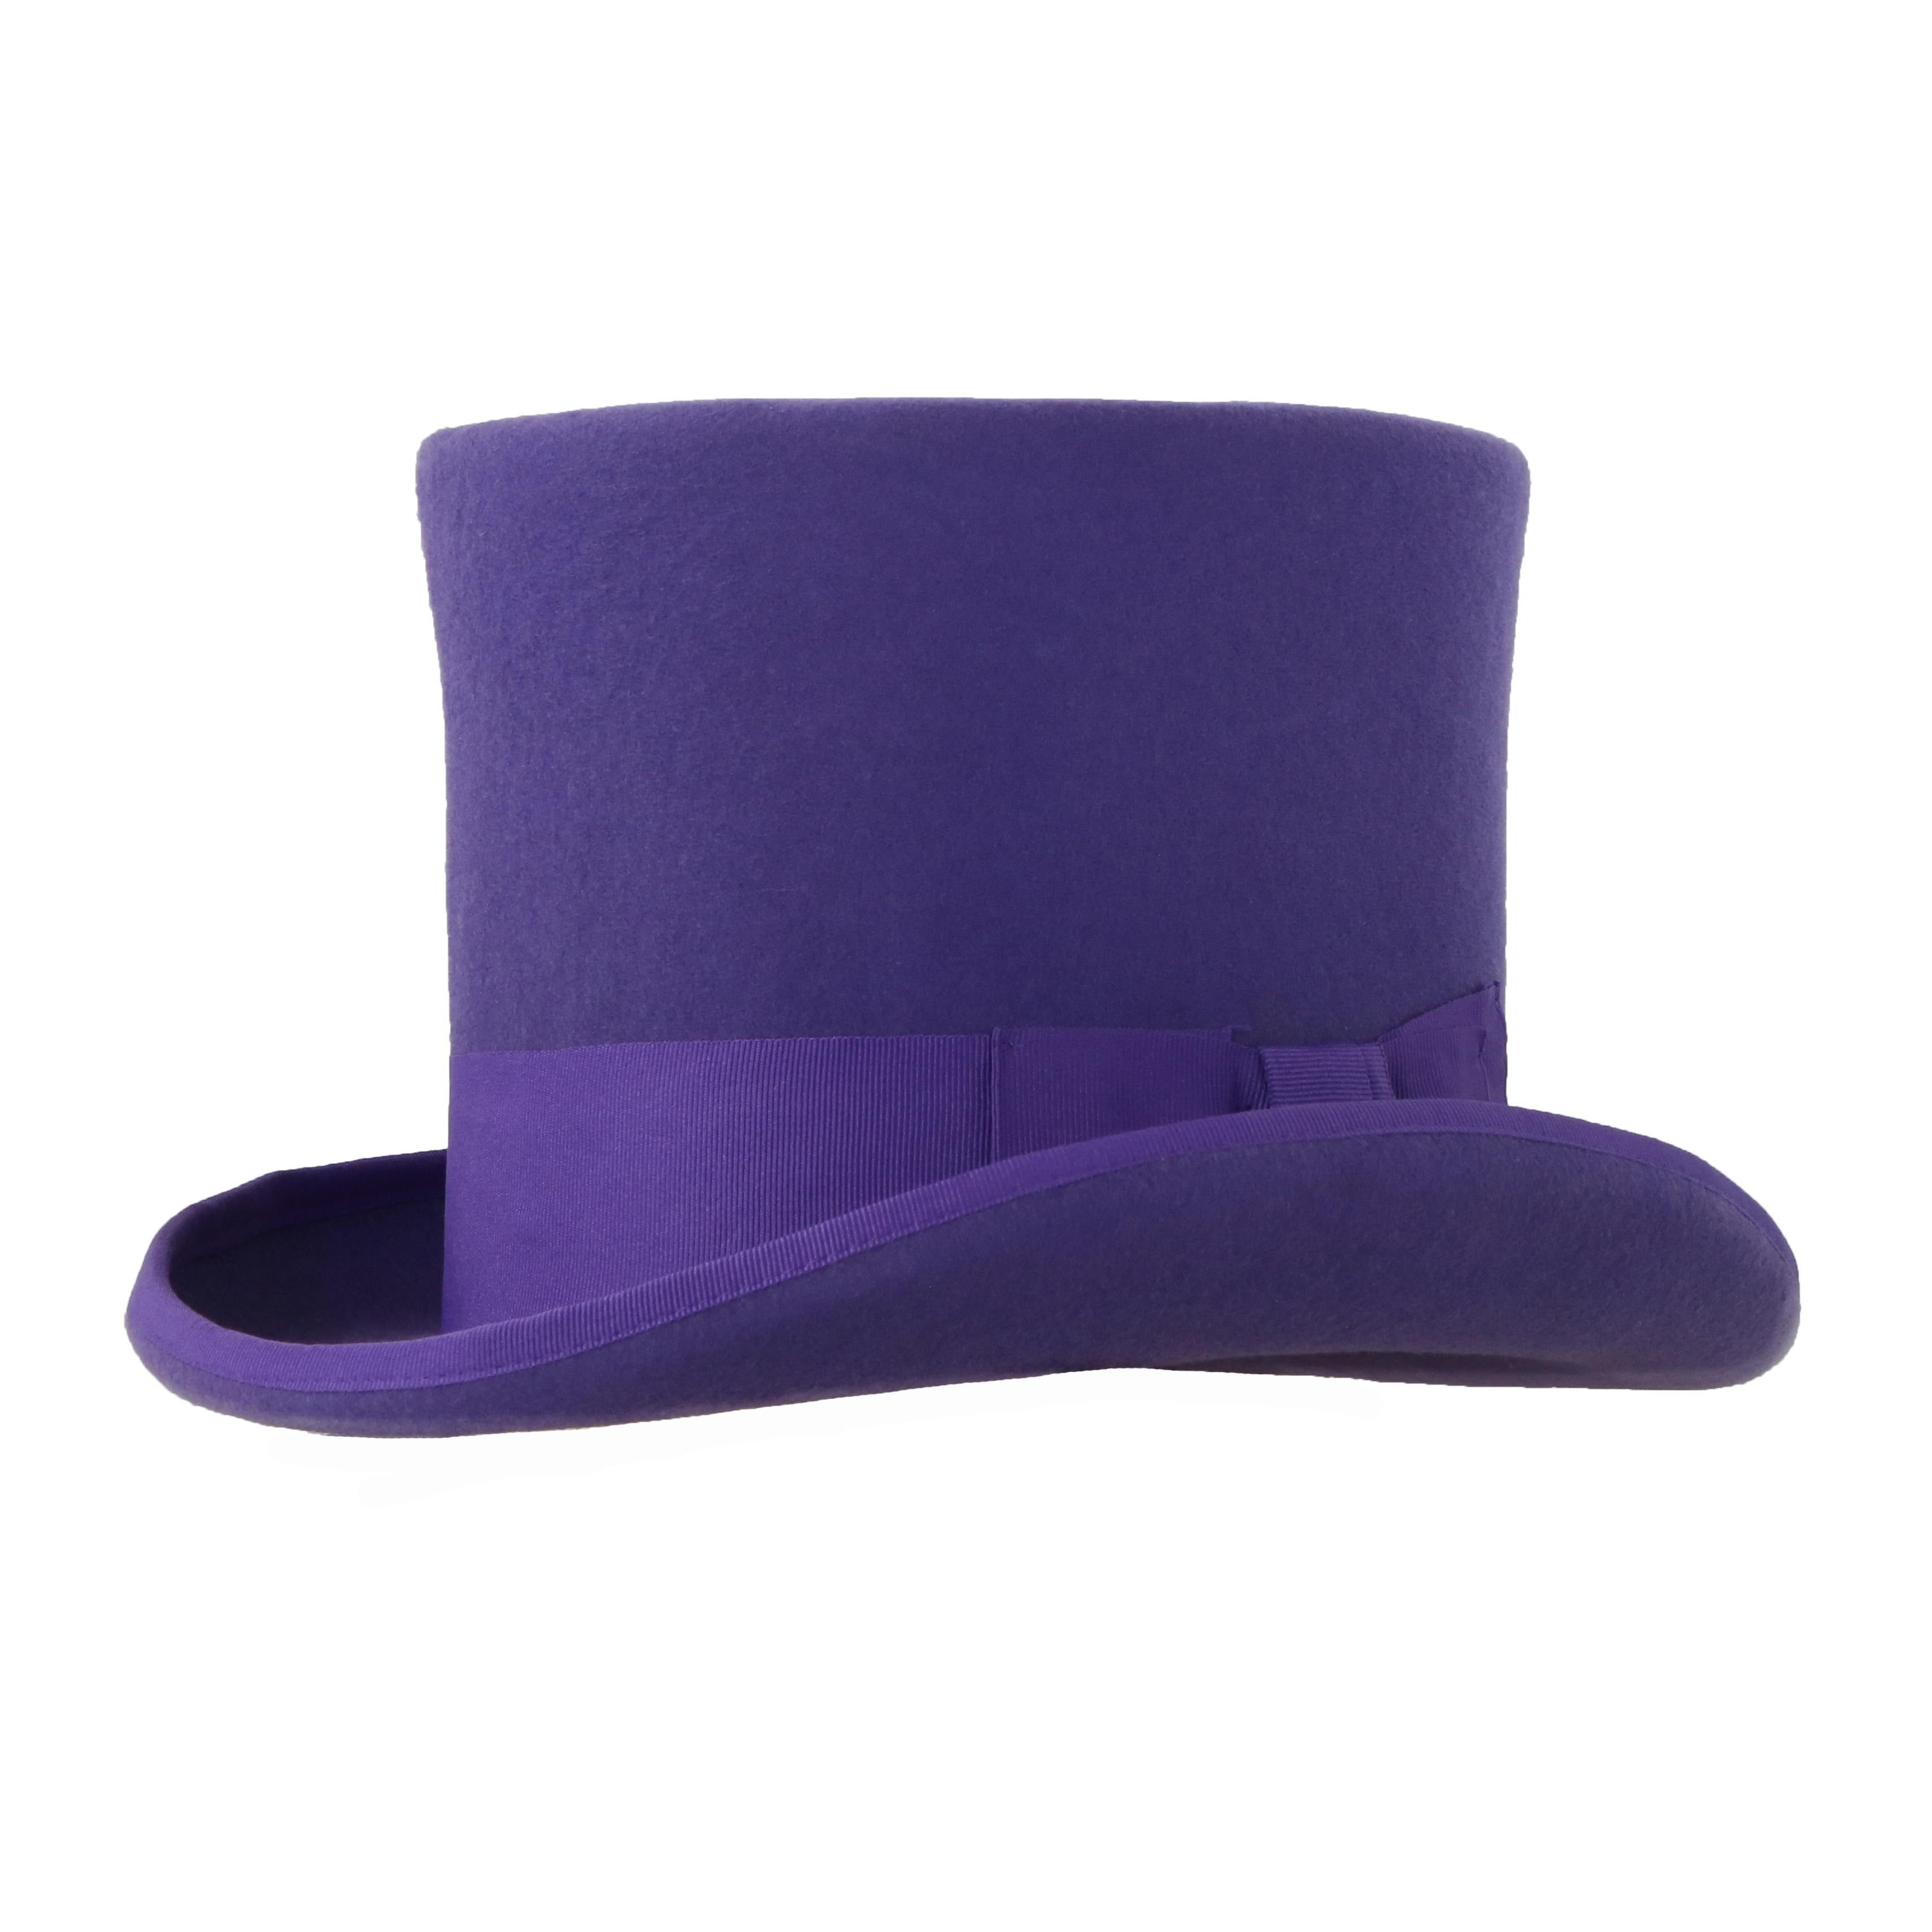 Shop Ferrecci Mens Ultra Violet Premium Wool Mad Hatter Steampunk ... 653915903e9